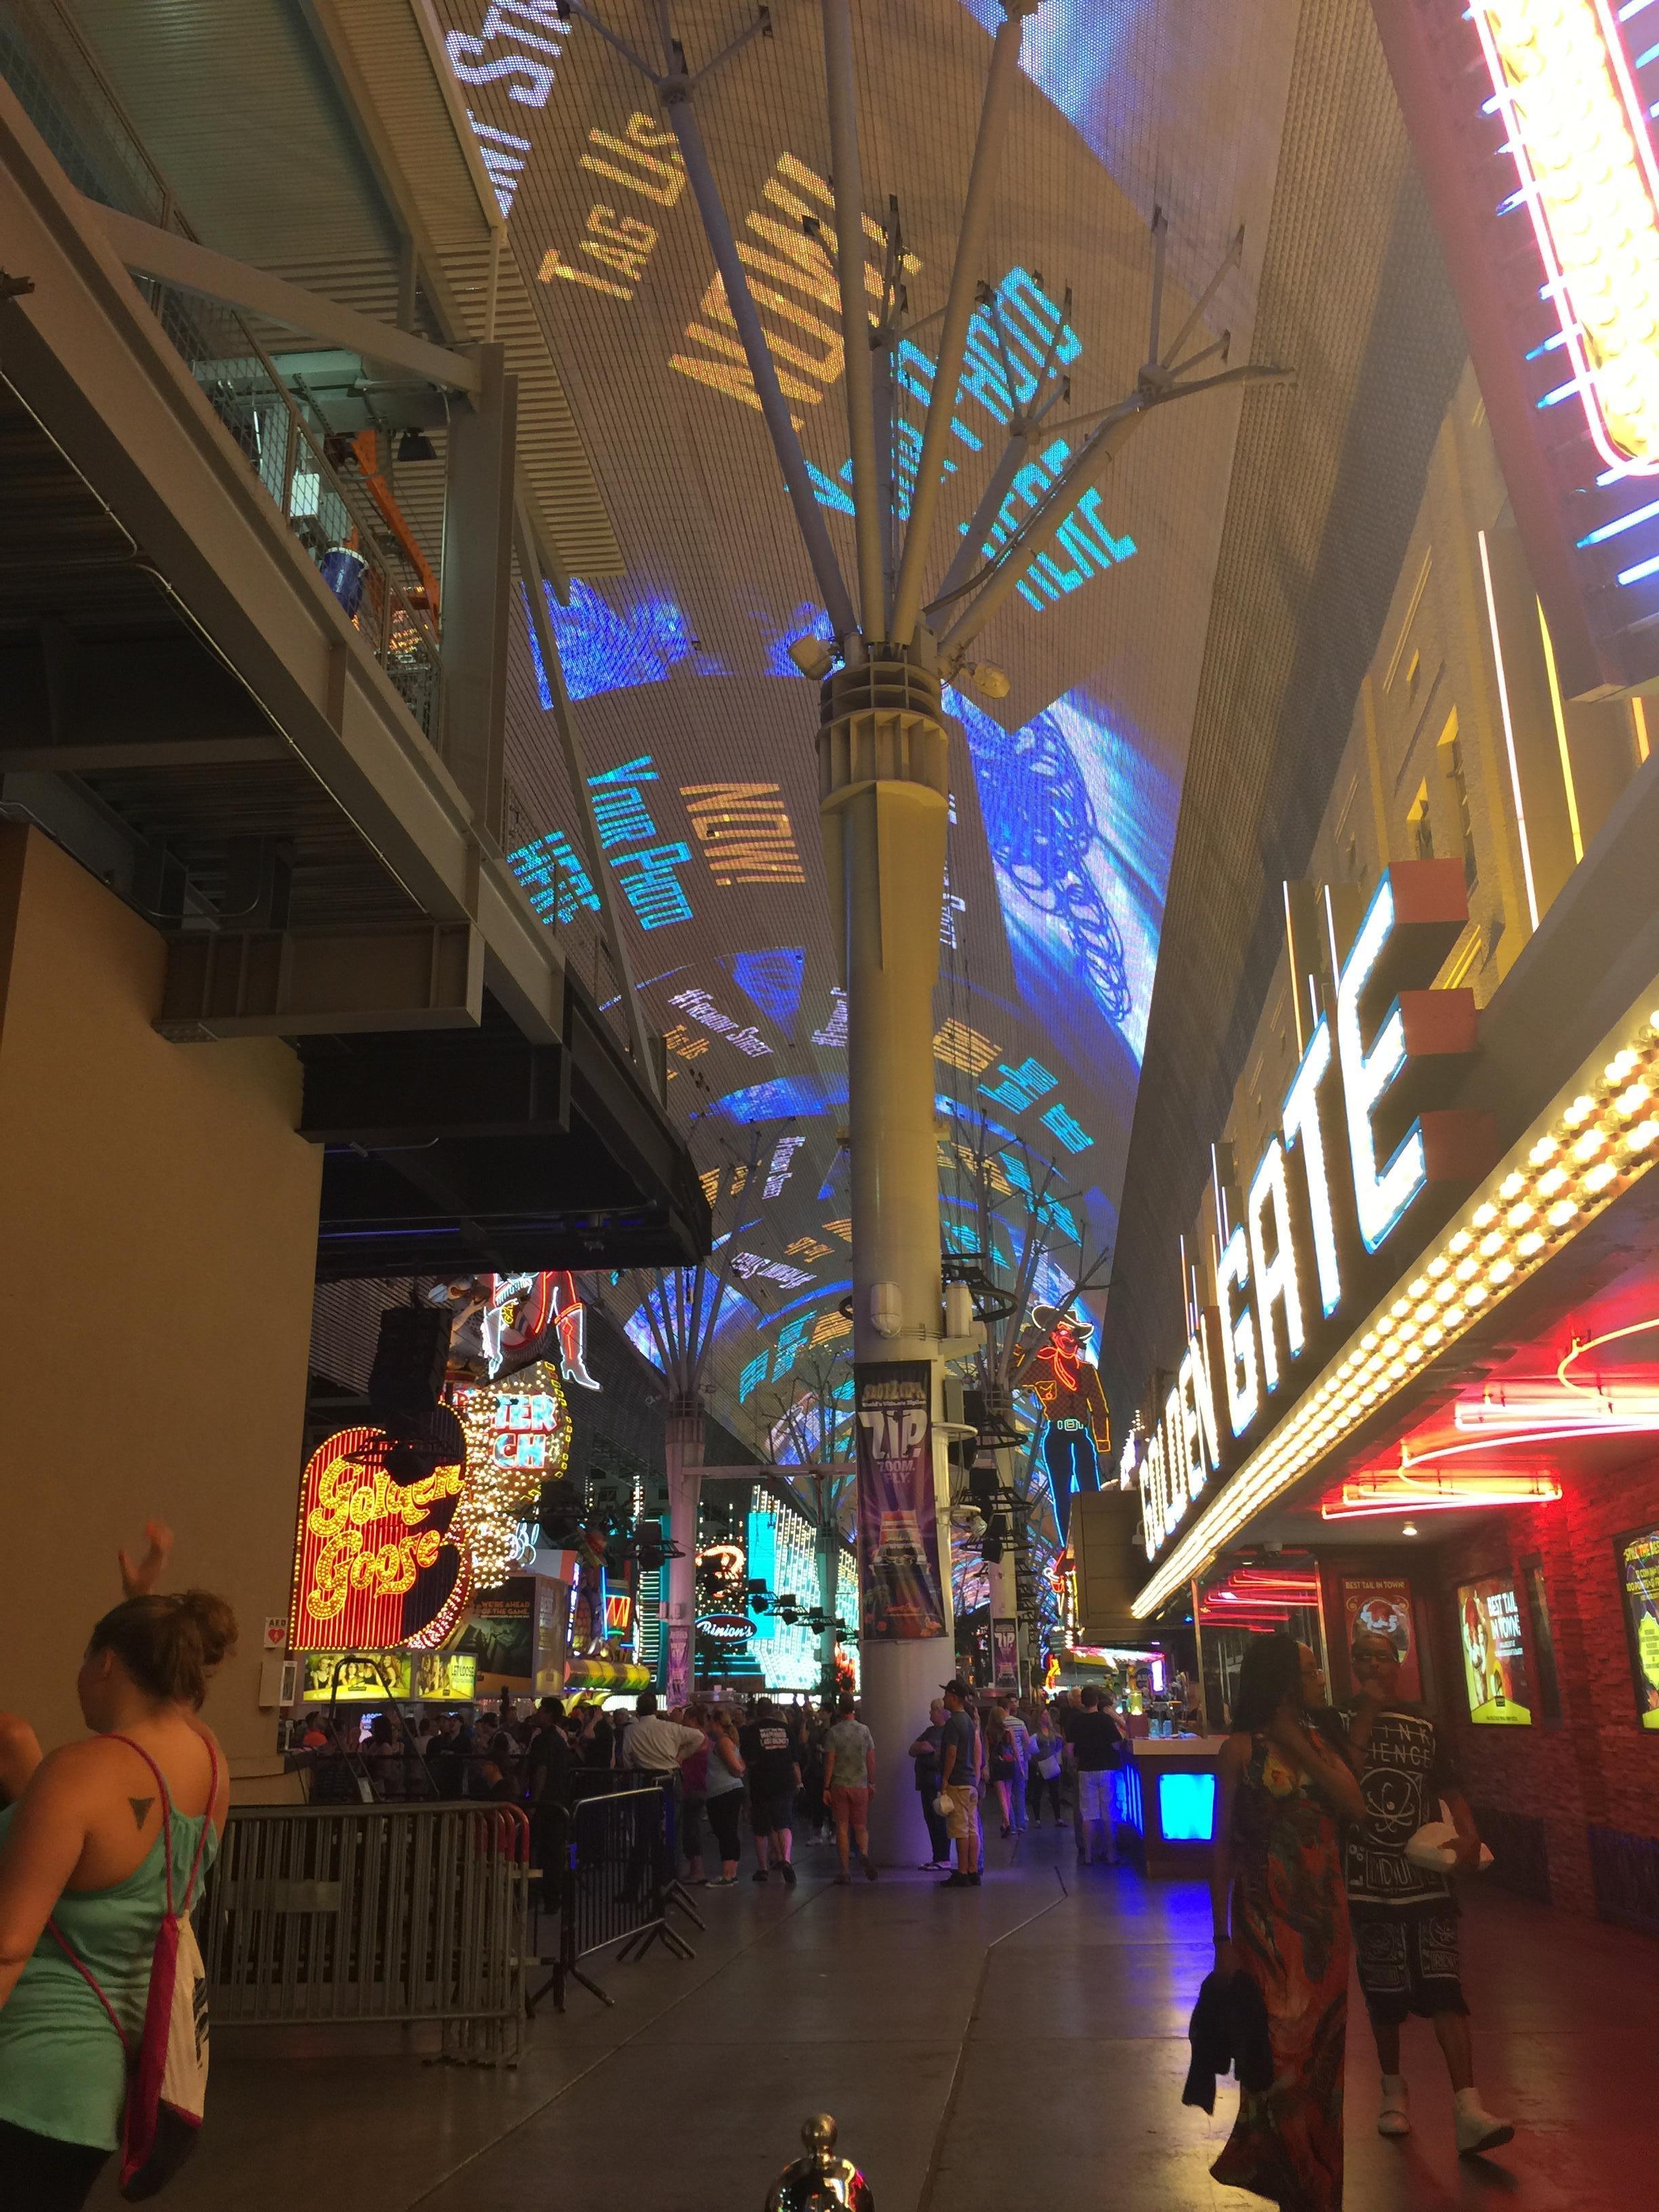 Paris of Las Vegas